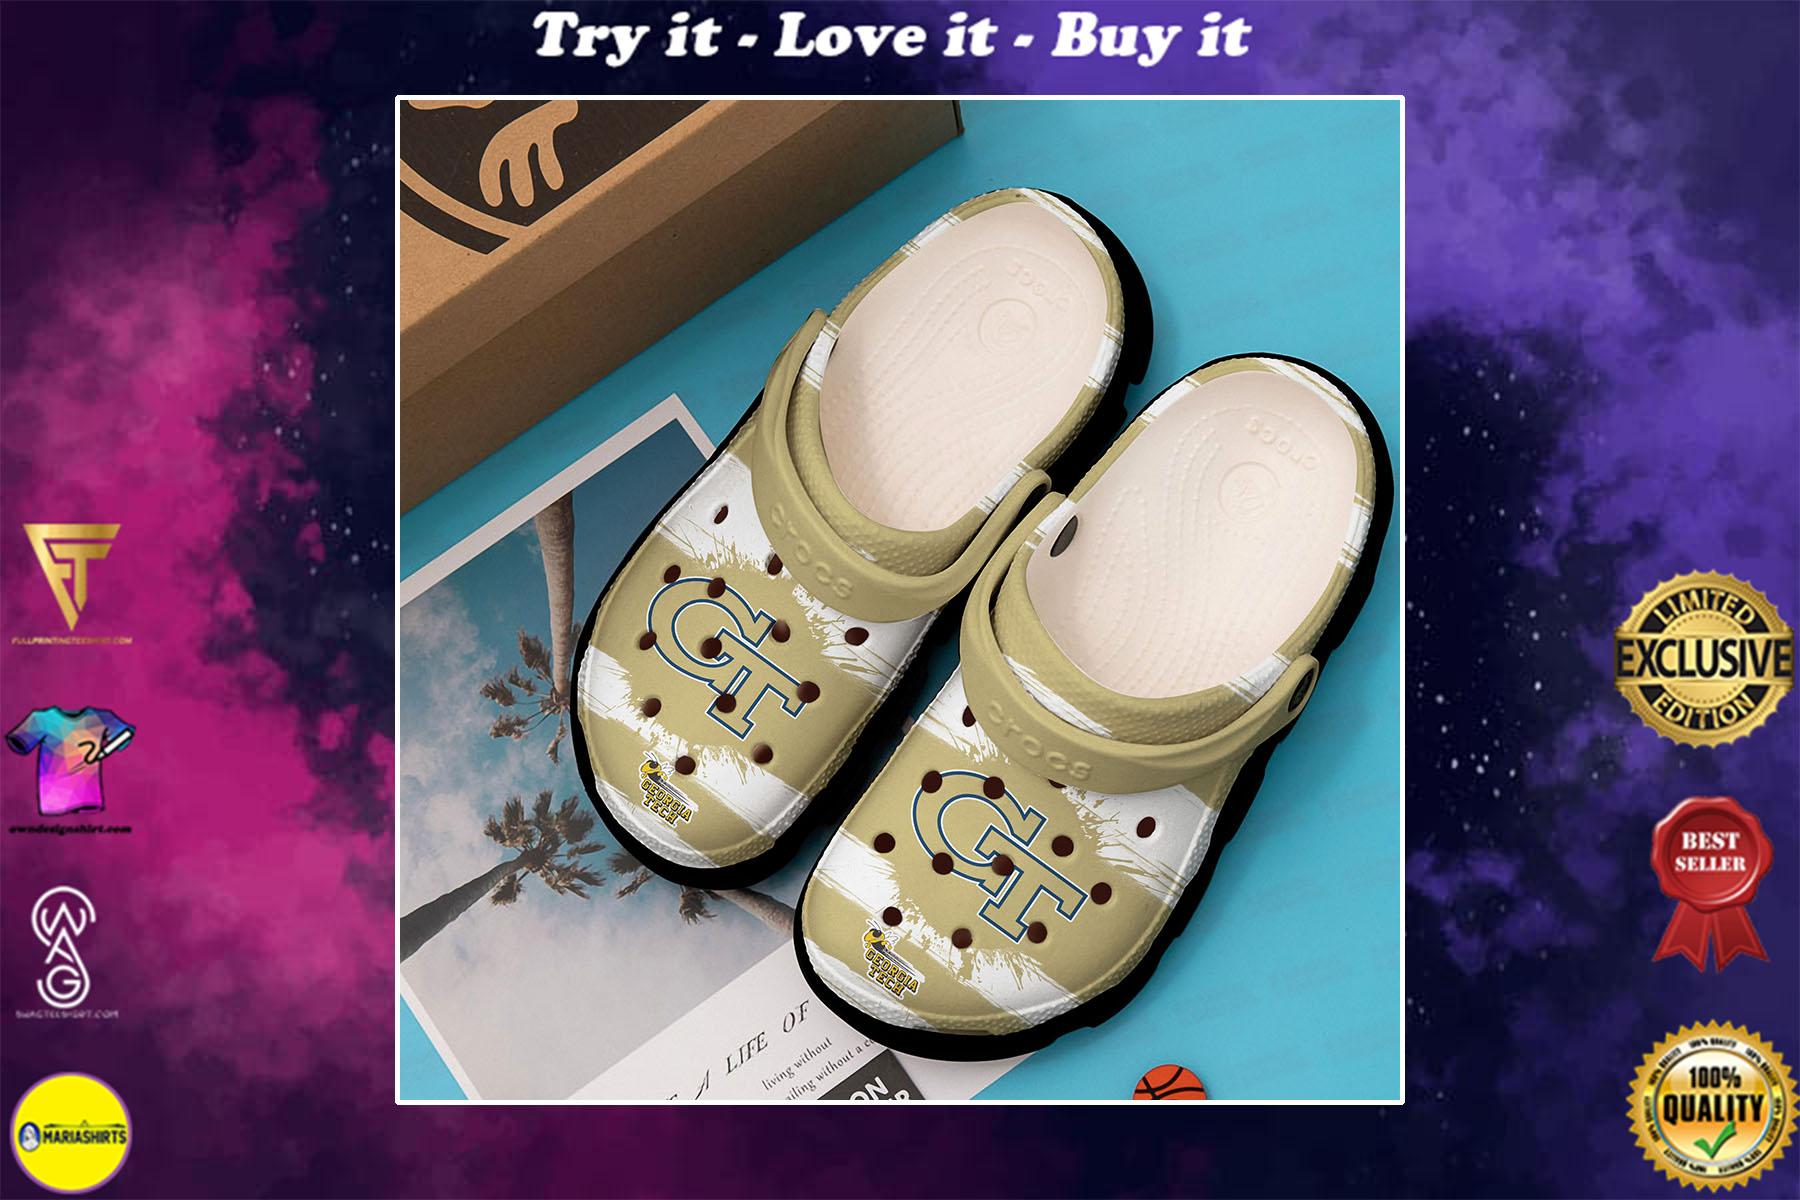 [special edition] georgia tech yellow jackets football crocs shoes - maria